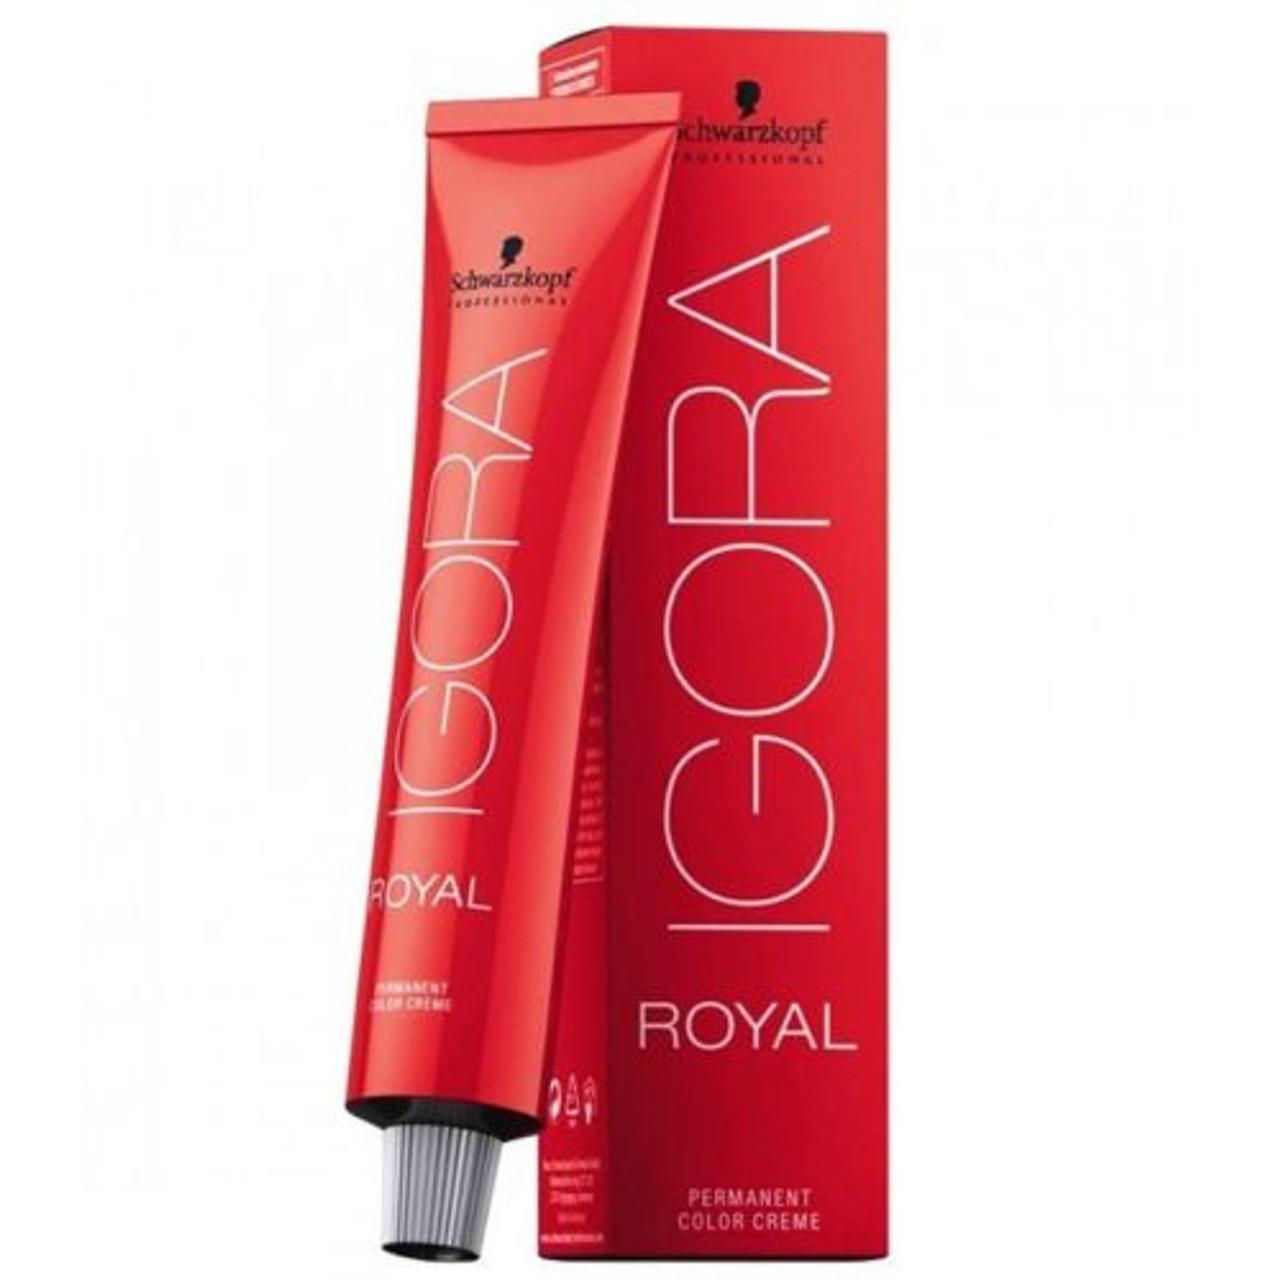 Schwarzkopf Igora Royal Permanent Color Creme - 6-77 Dark Copper blonde